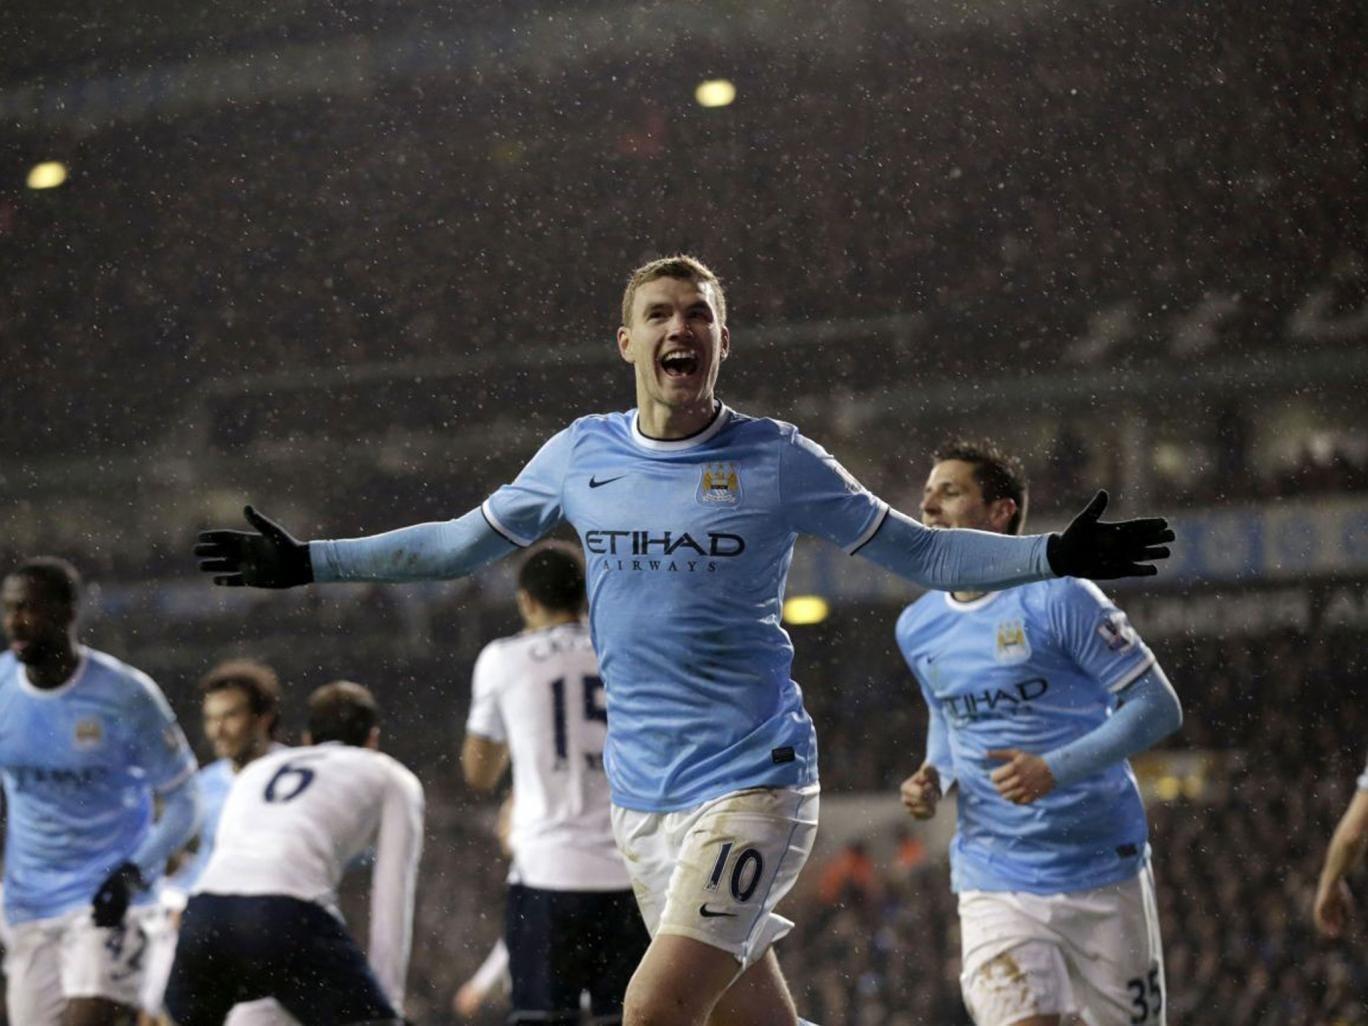 City slicker: Edin Dzeko celebrates scoring City's third goal against Tottenham